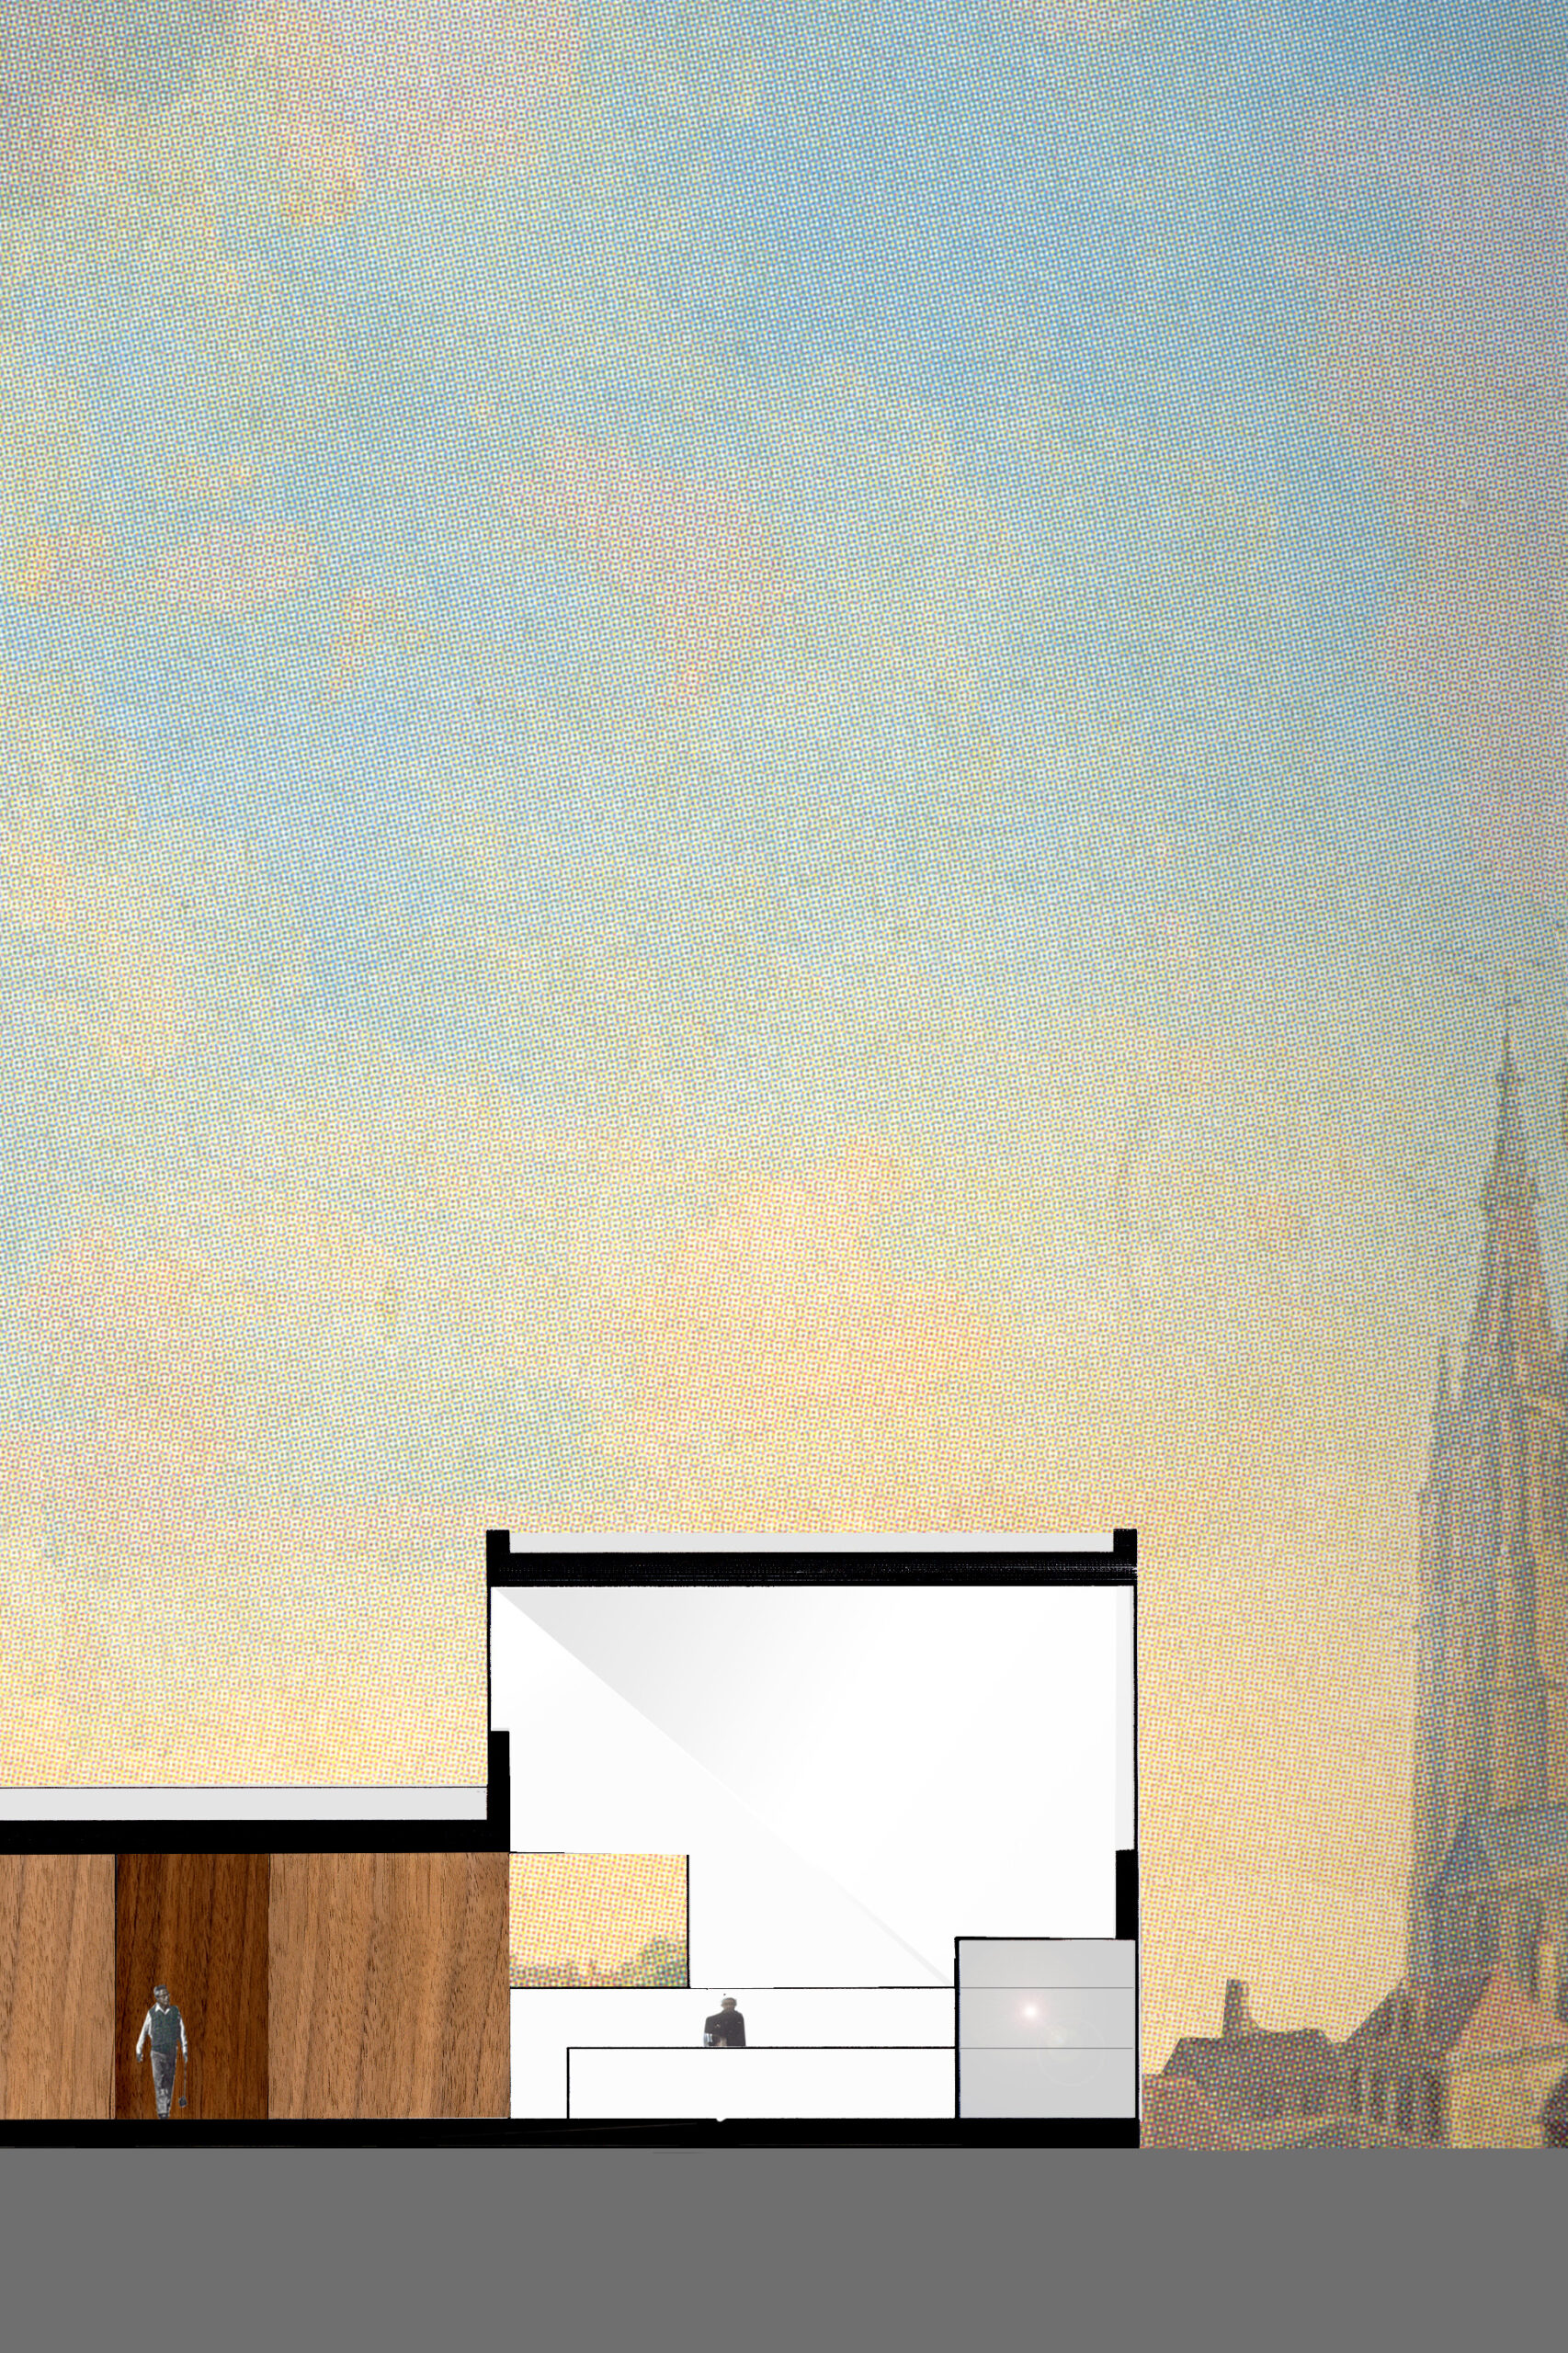 0204 Groeningemuseum